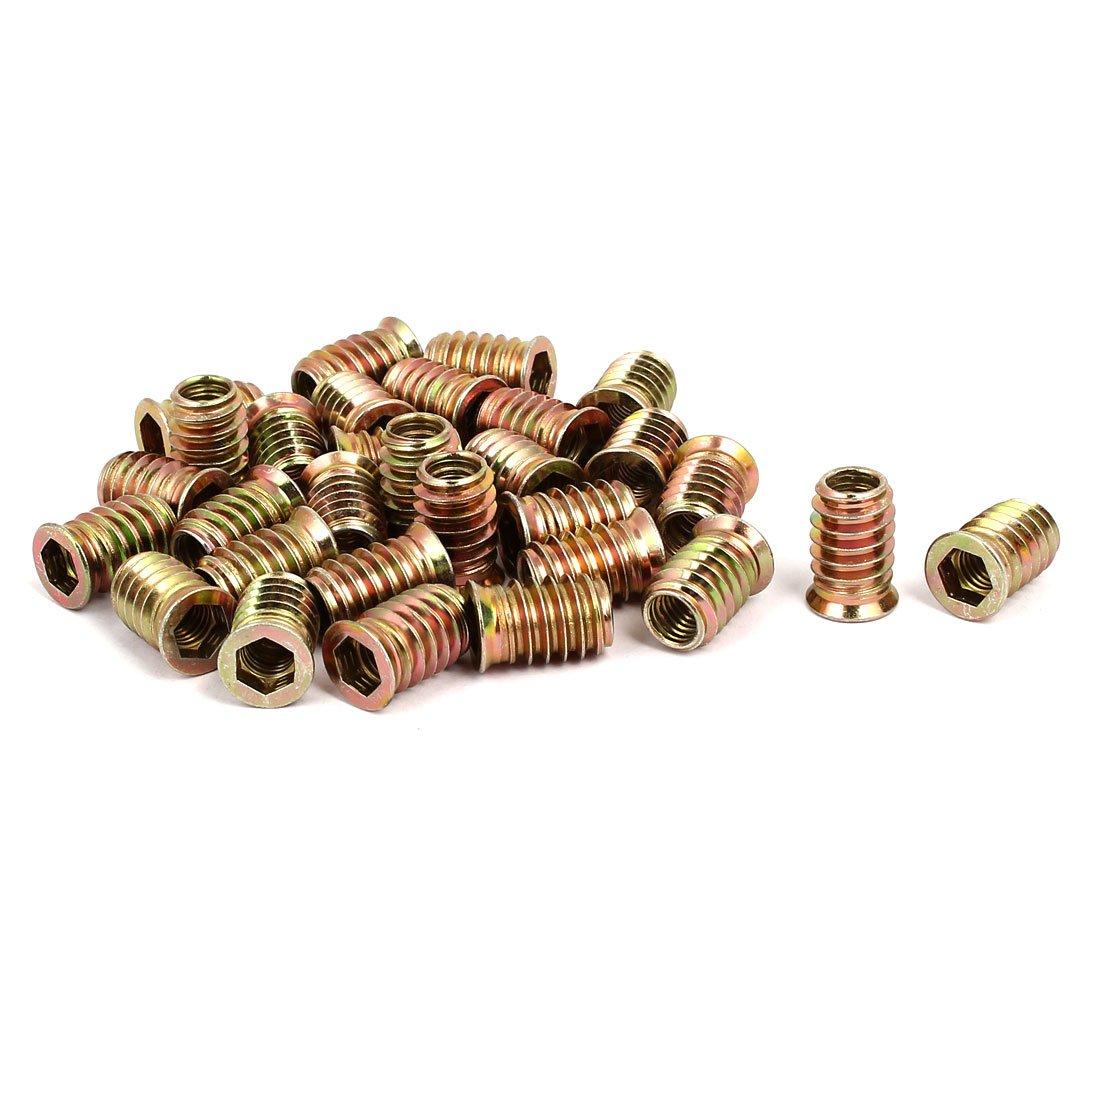 uxcell Wood Furniture M8x20mm Insert Interface Hex Socket E-Nut Bronze Tone 30pcs